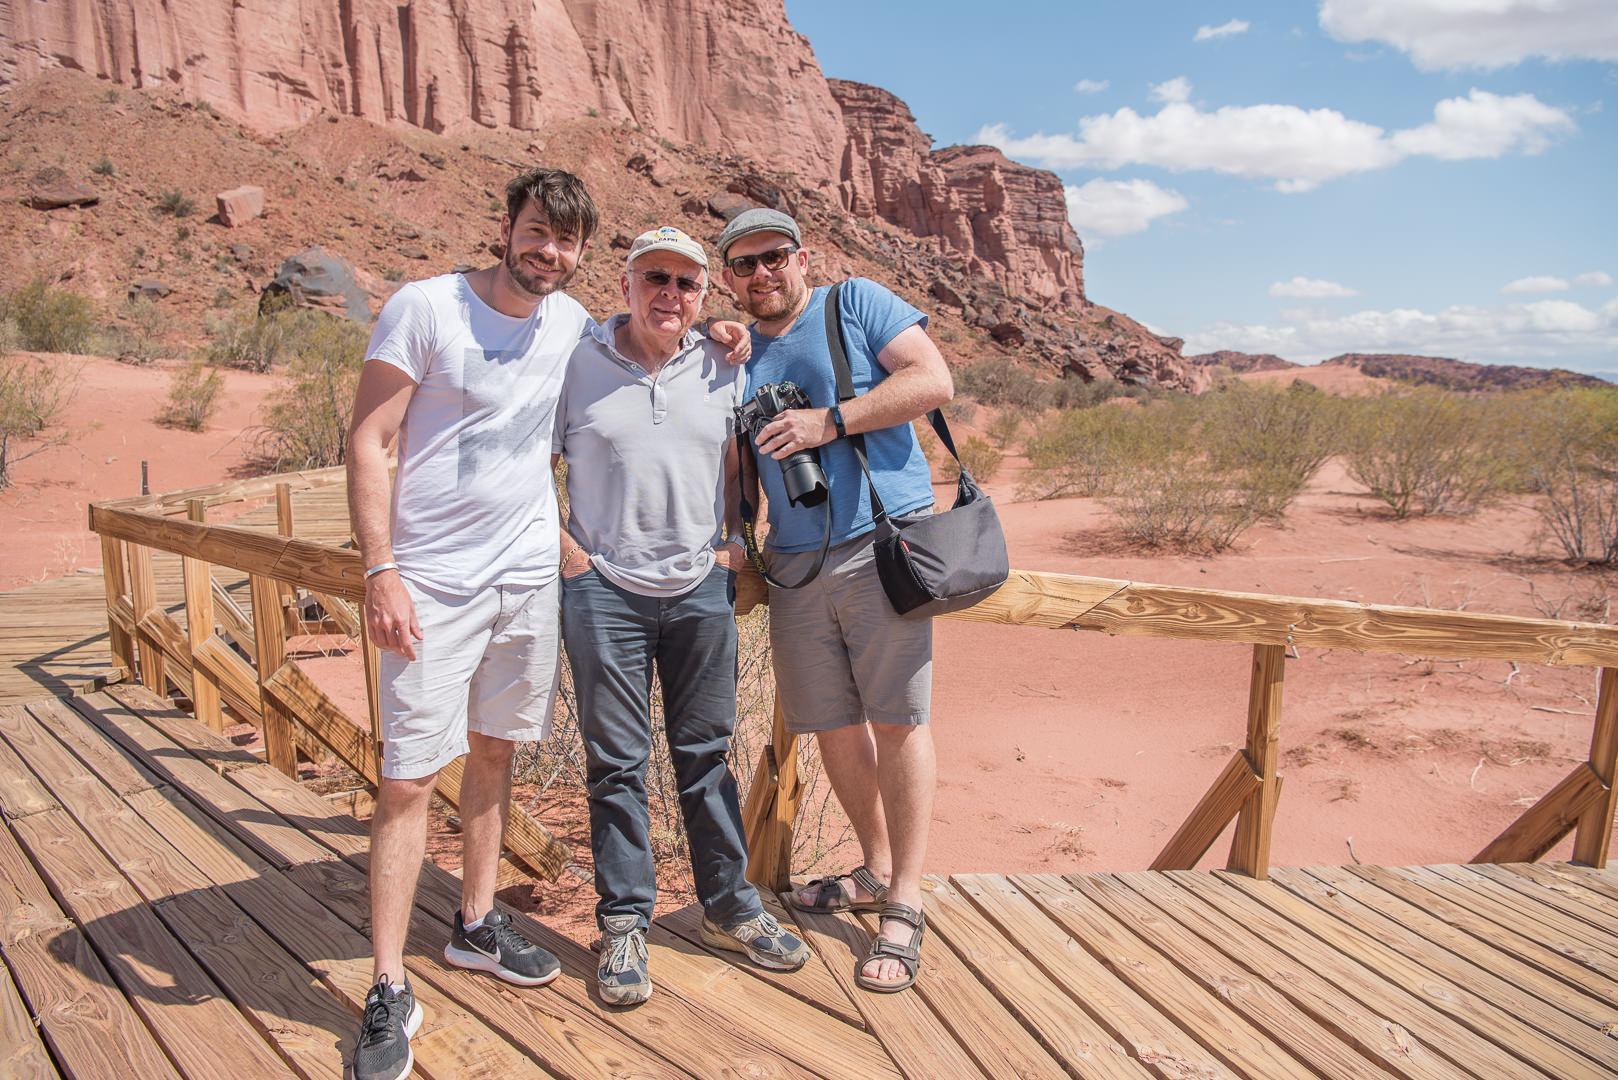 Trip from Mendoza to Salta, Argentina. Talampaya National Park